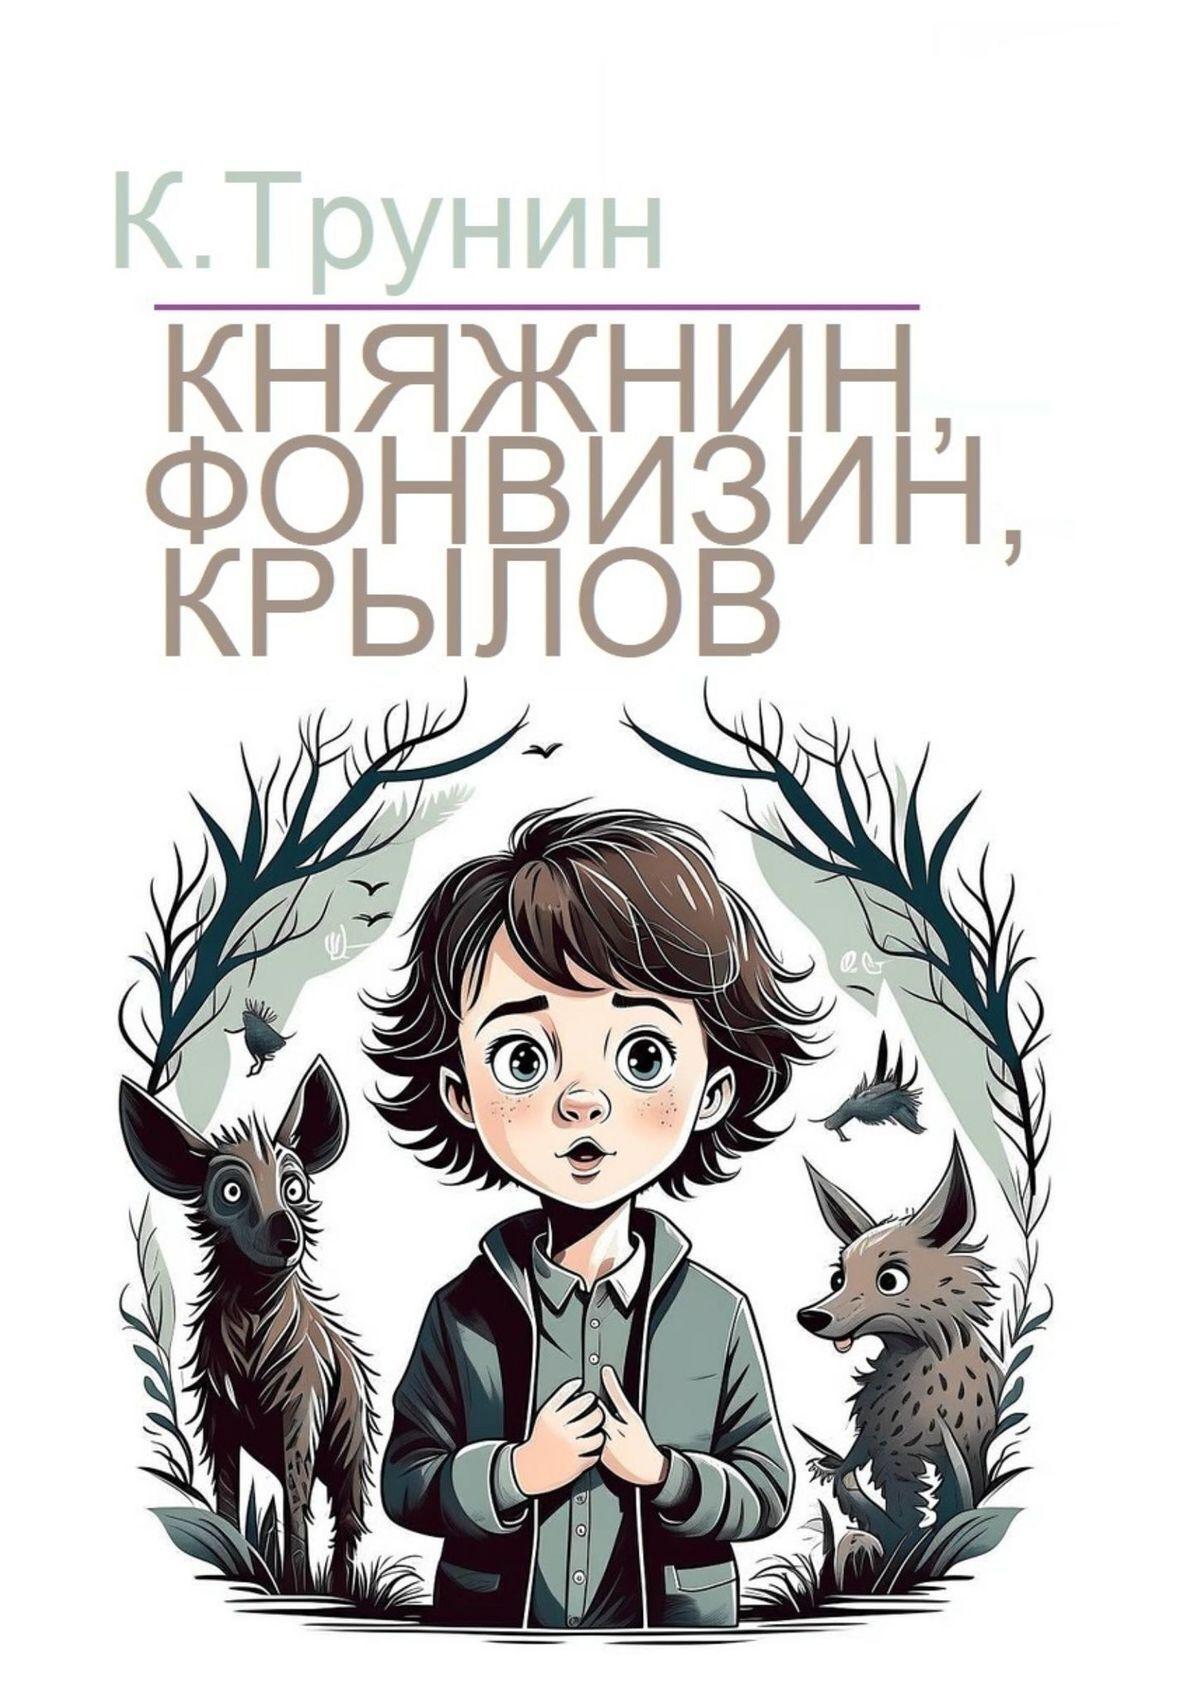 Княжнин, Фонвизин, Крылов. Критика и анализ литературного наследия